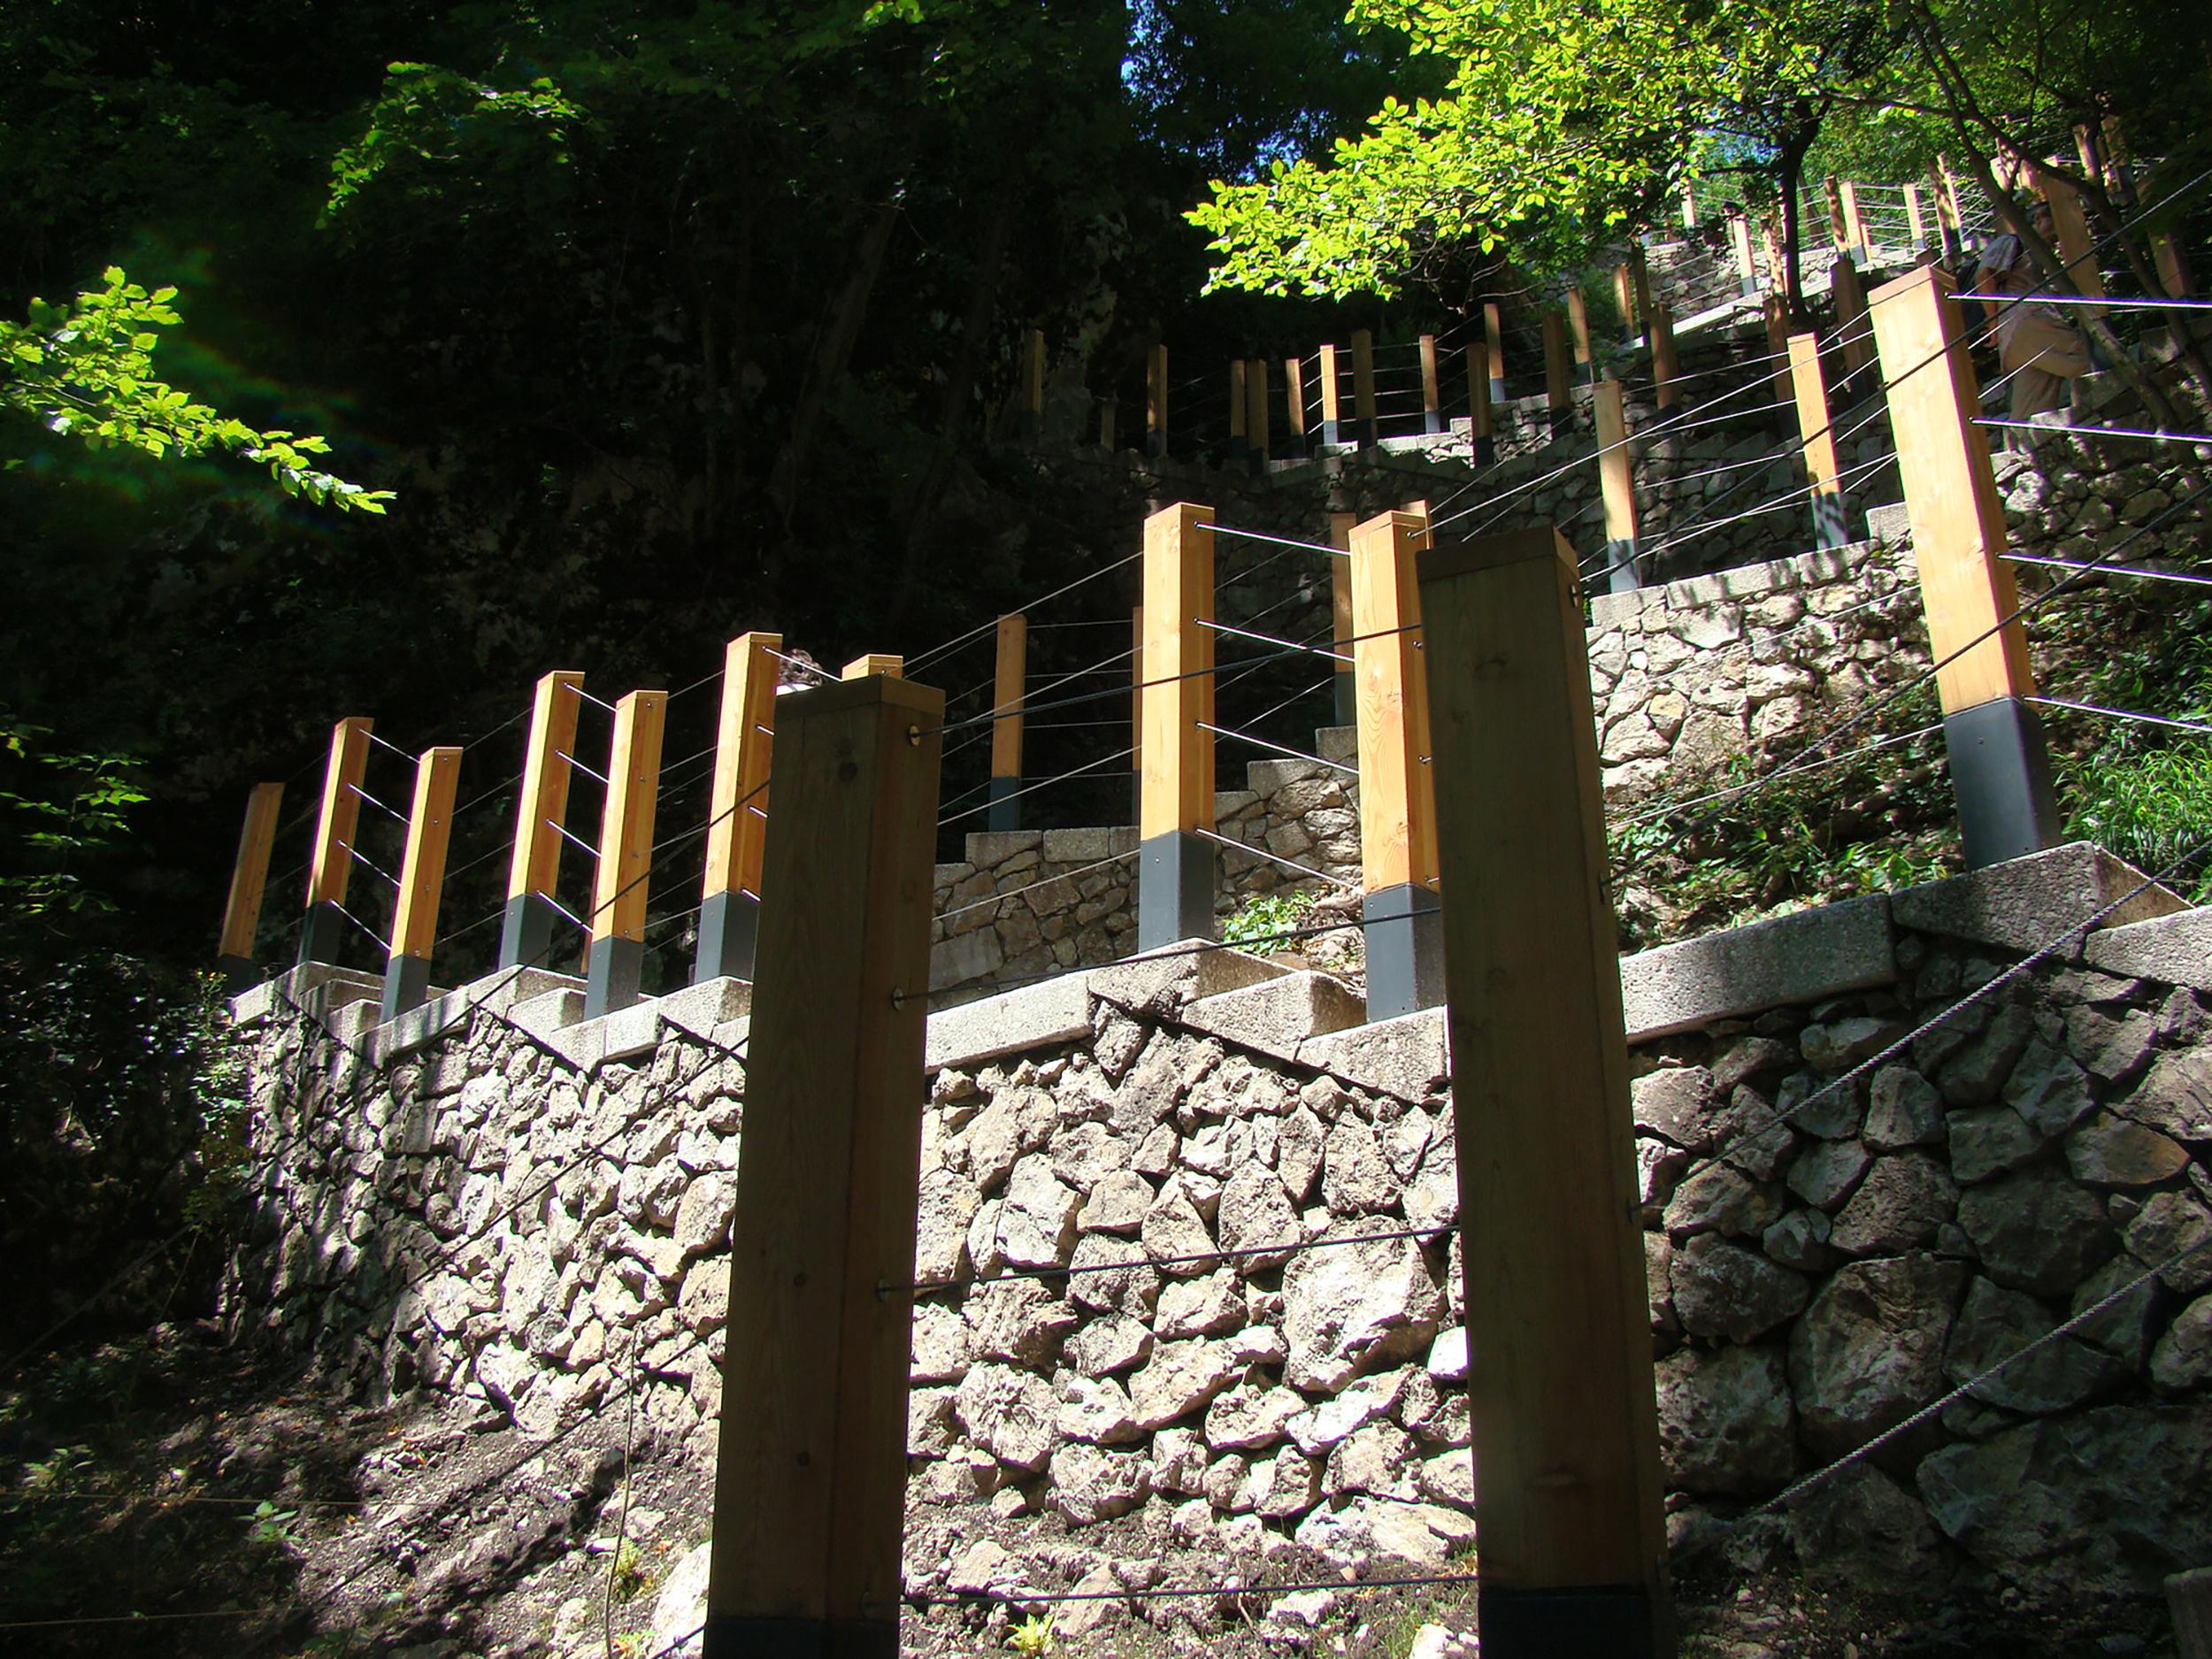 bruto bled pot na grad jezero castle lake path stairs stopnice